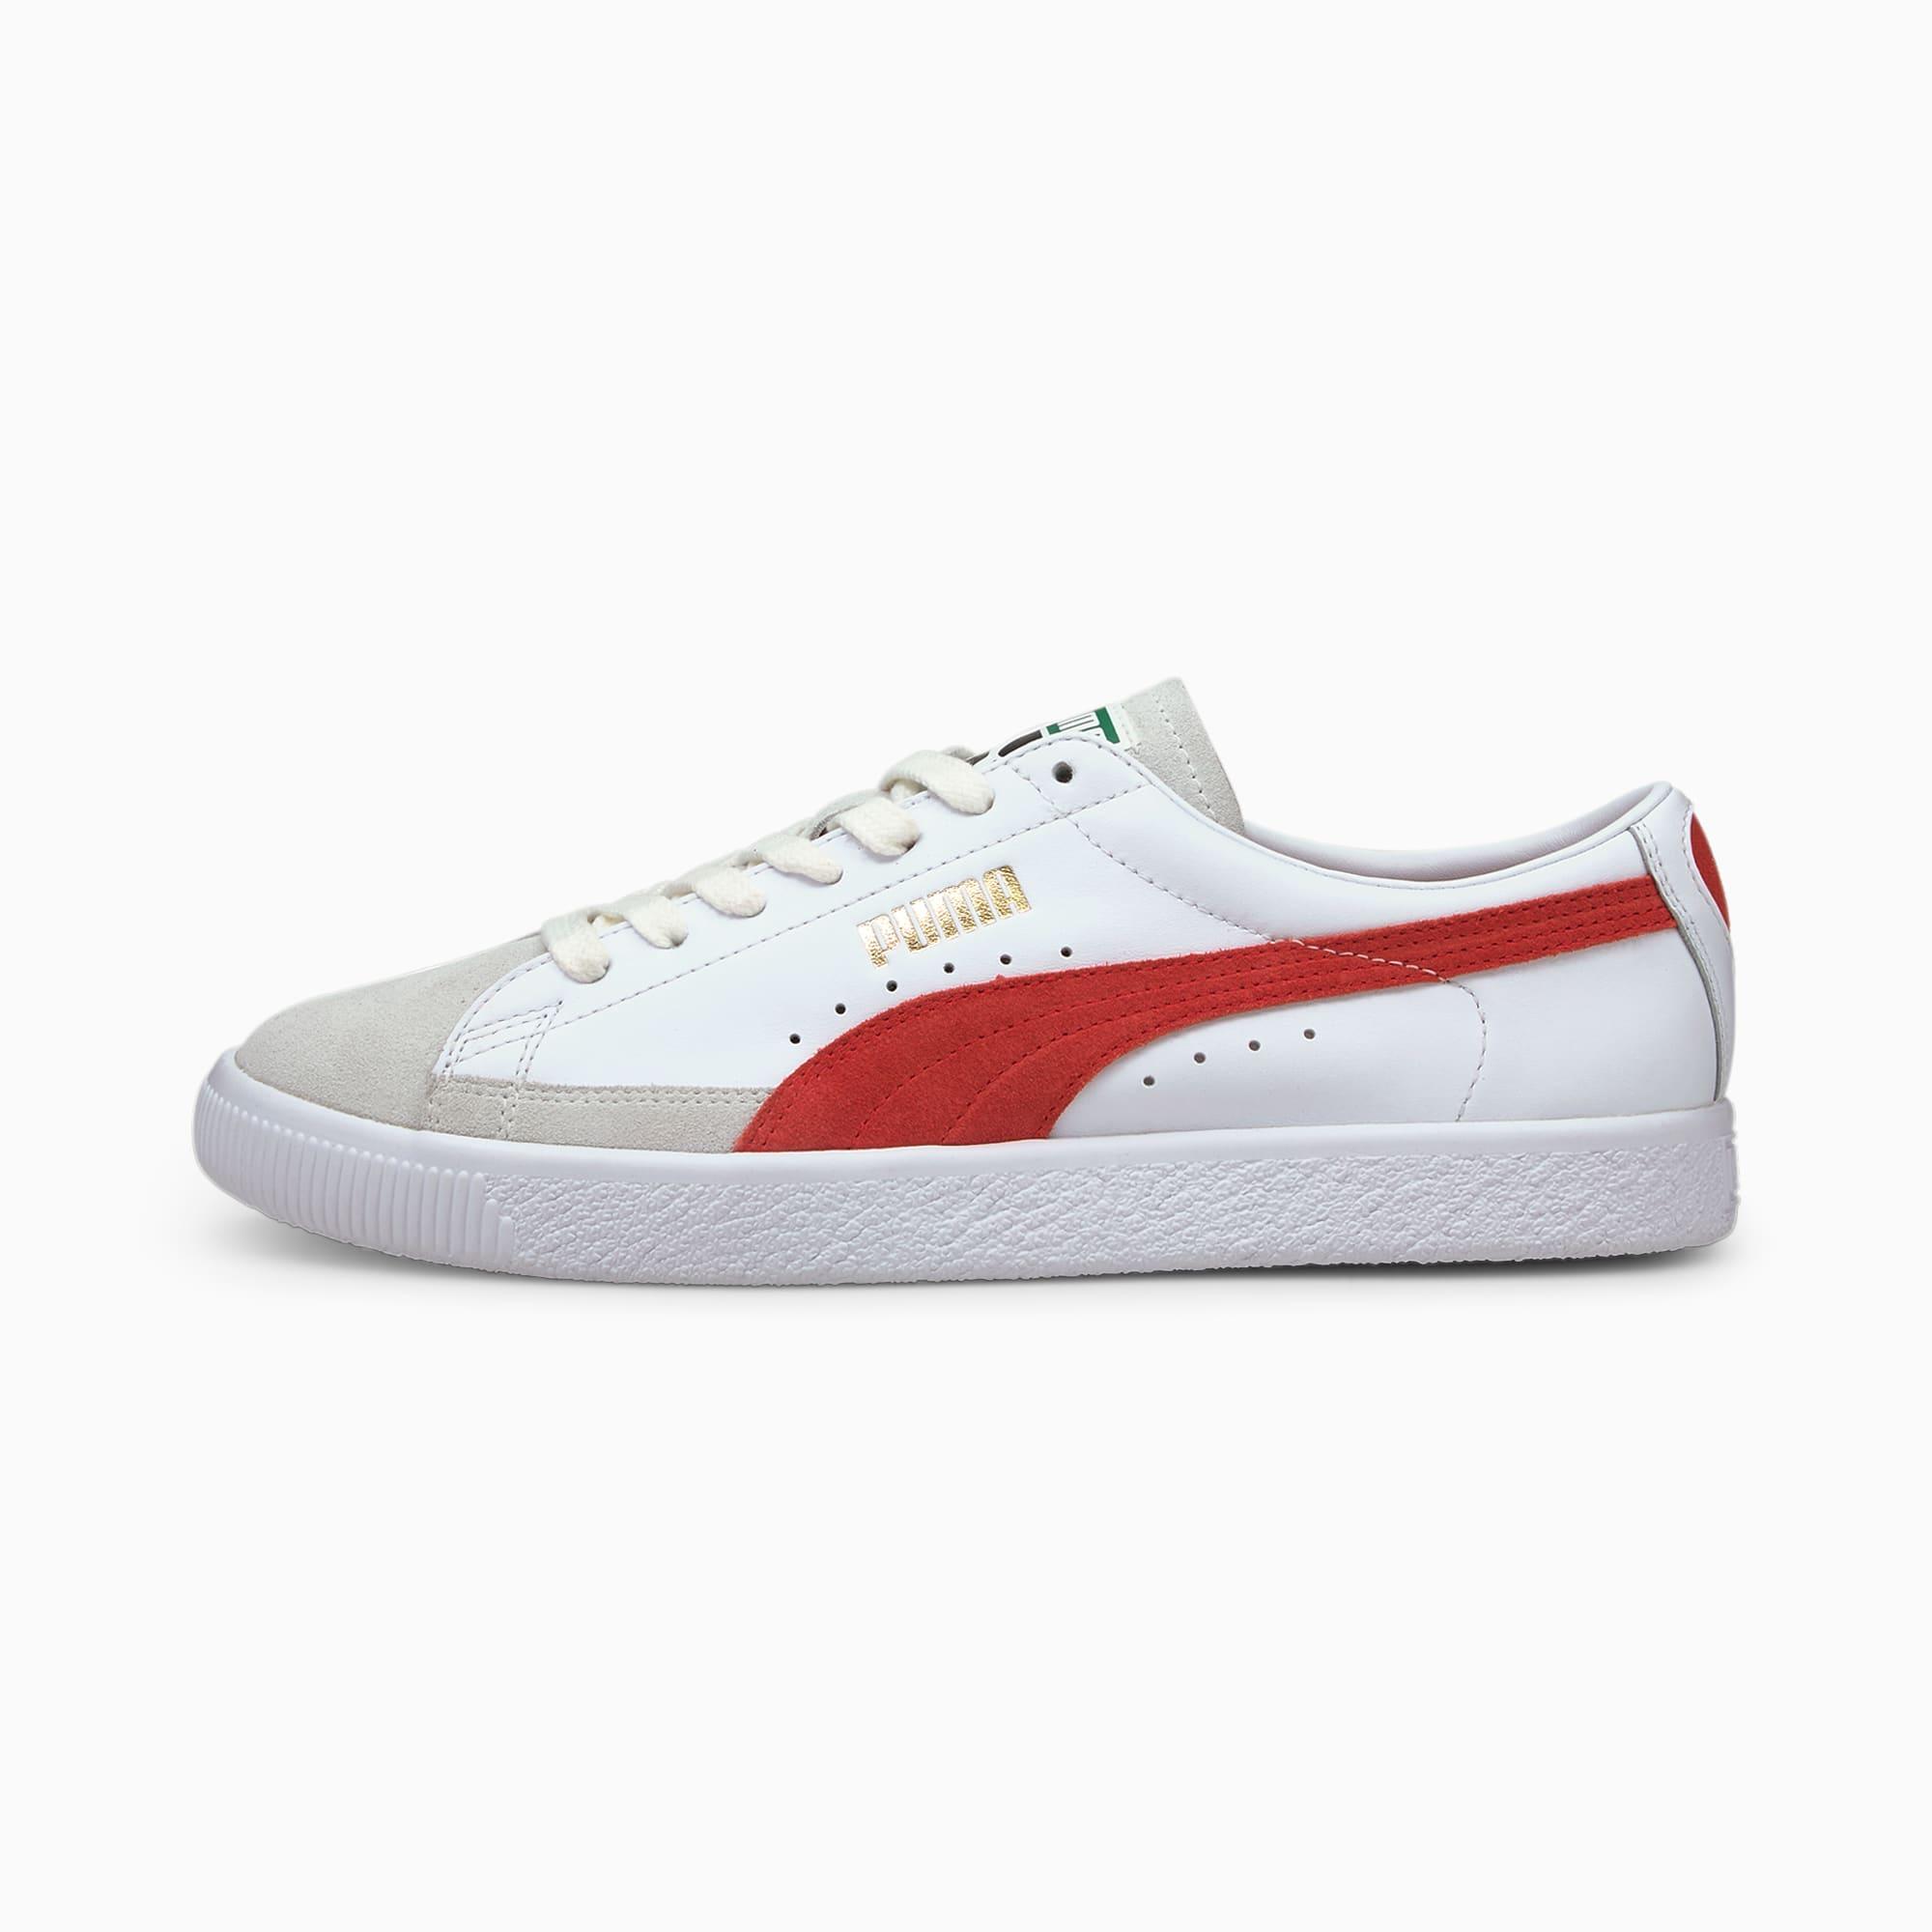 Chaussure Baskets Basket VTG, Blanc/Rouge, Taille 39, Chaussures - PUMA - Modalova